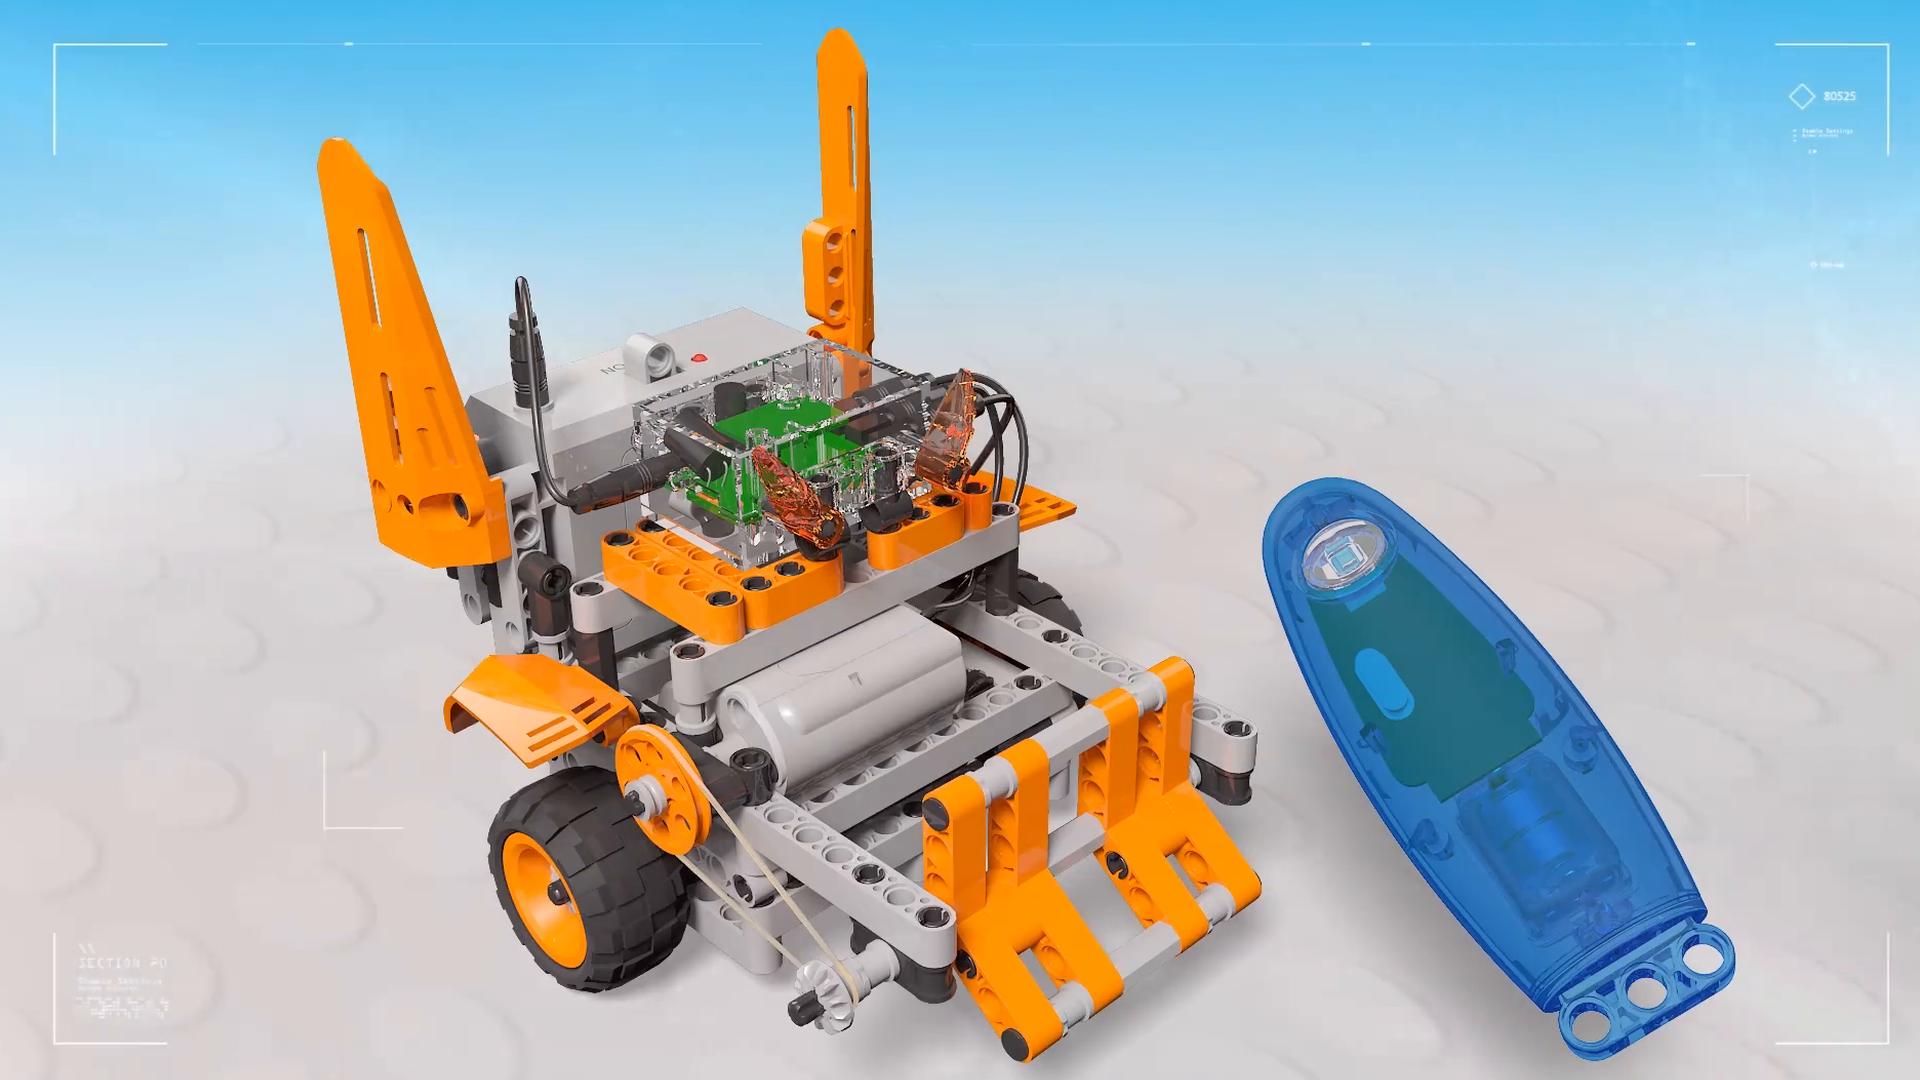 Steam Block Toys Somatosensory remote control robot Model: 6925